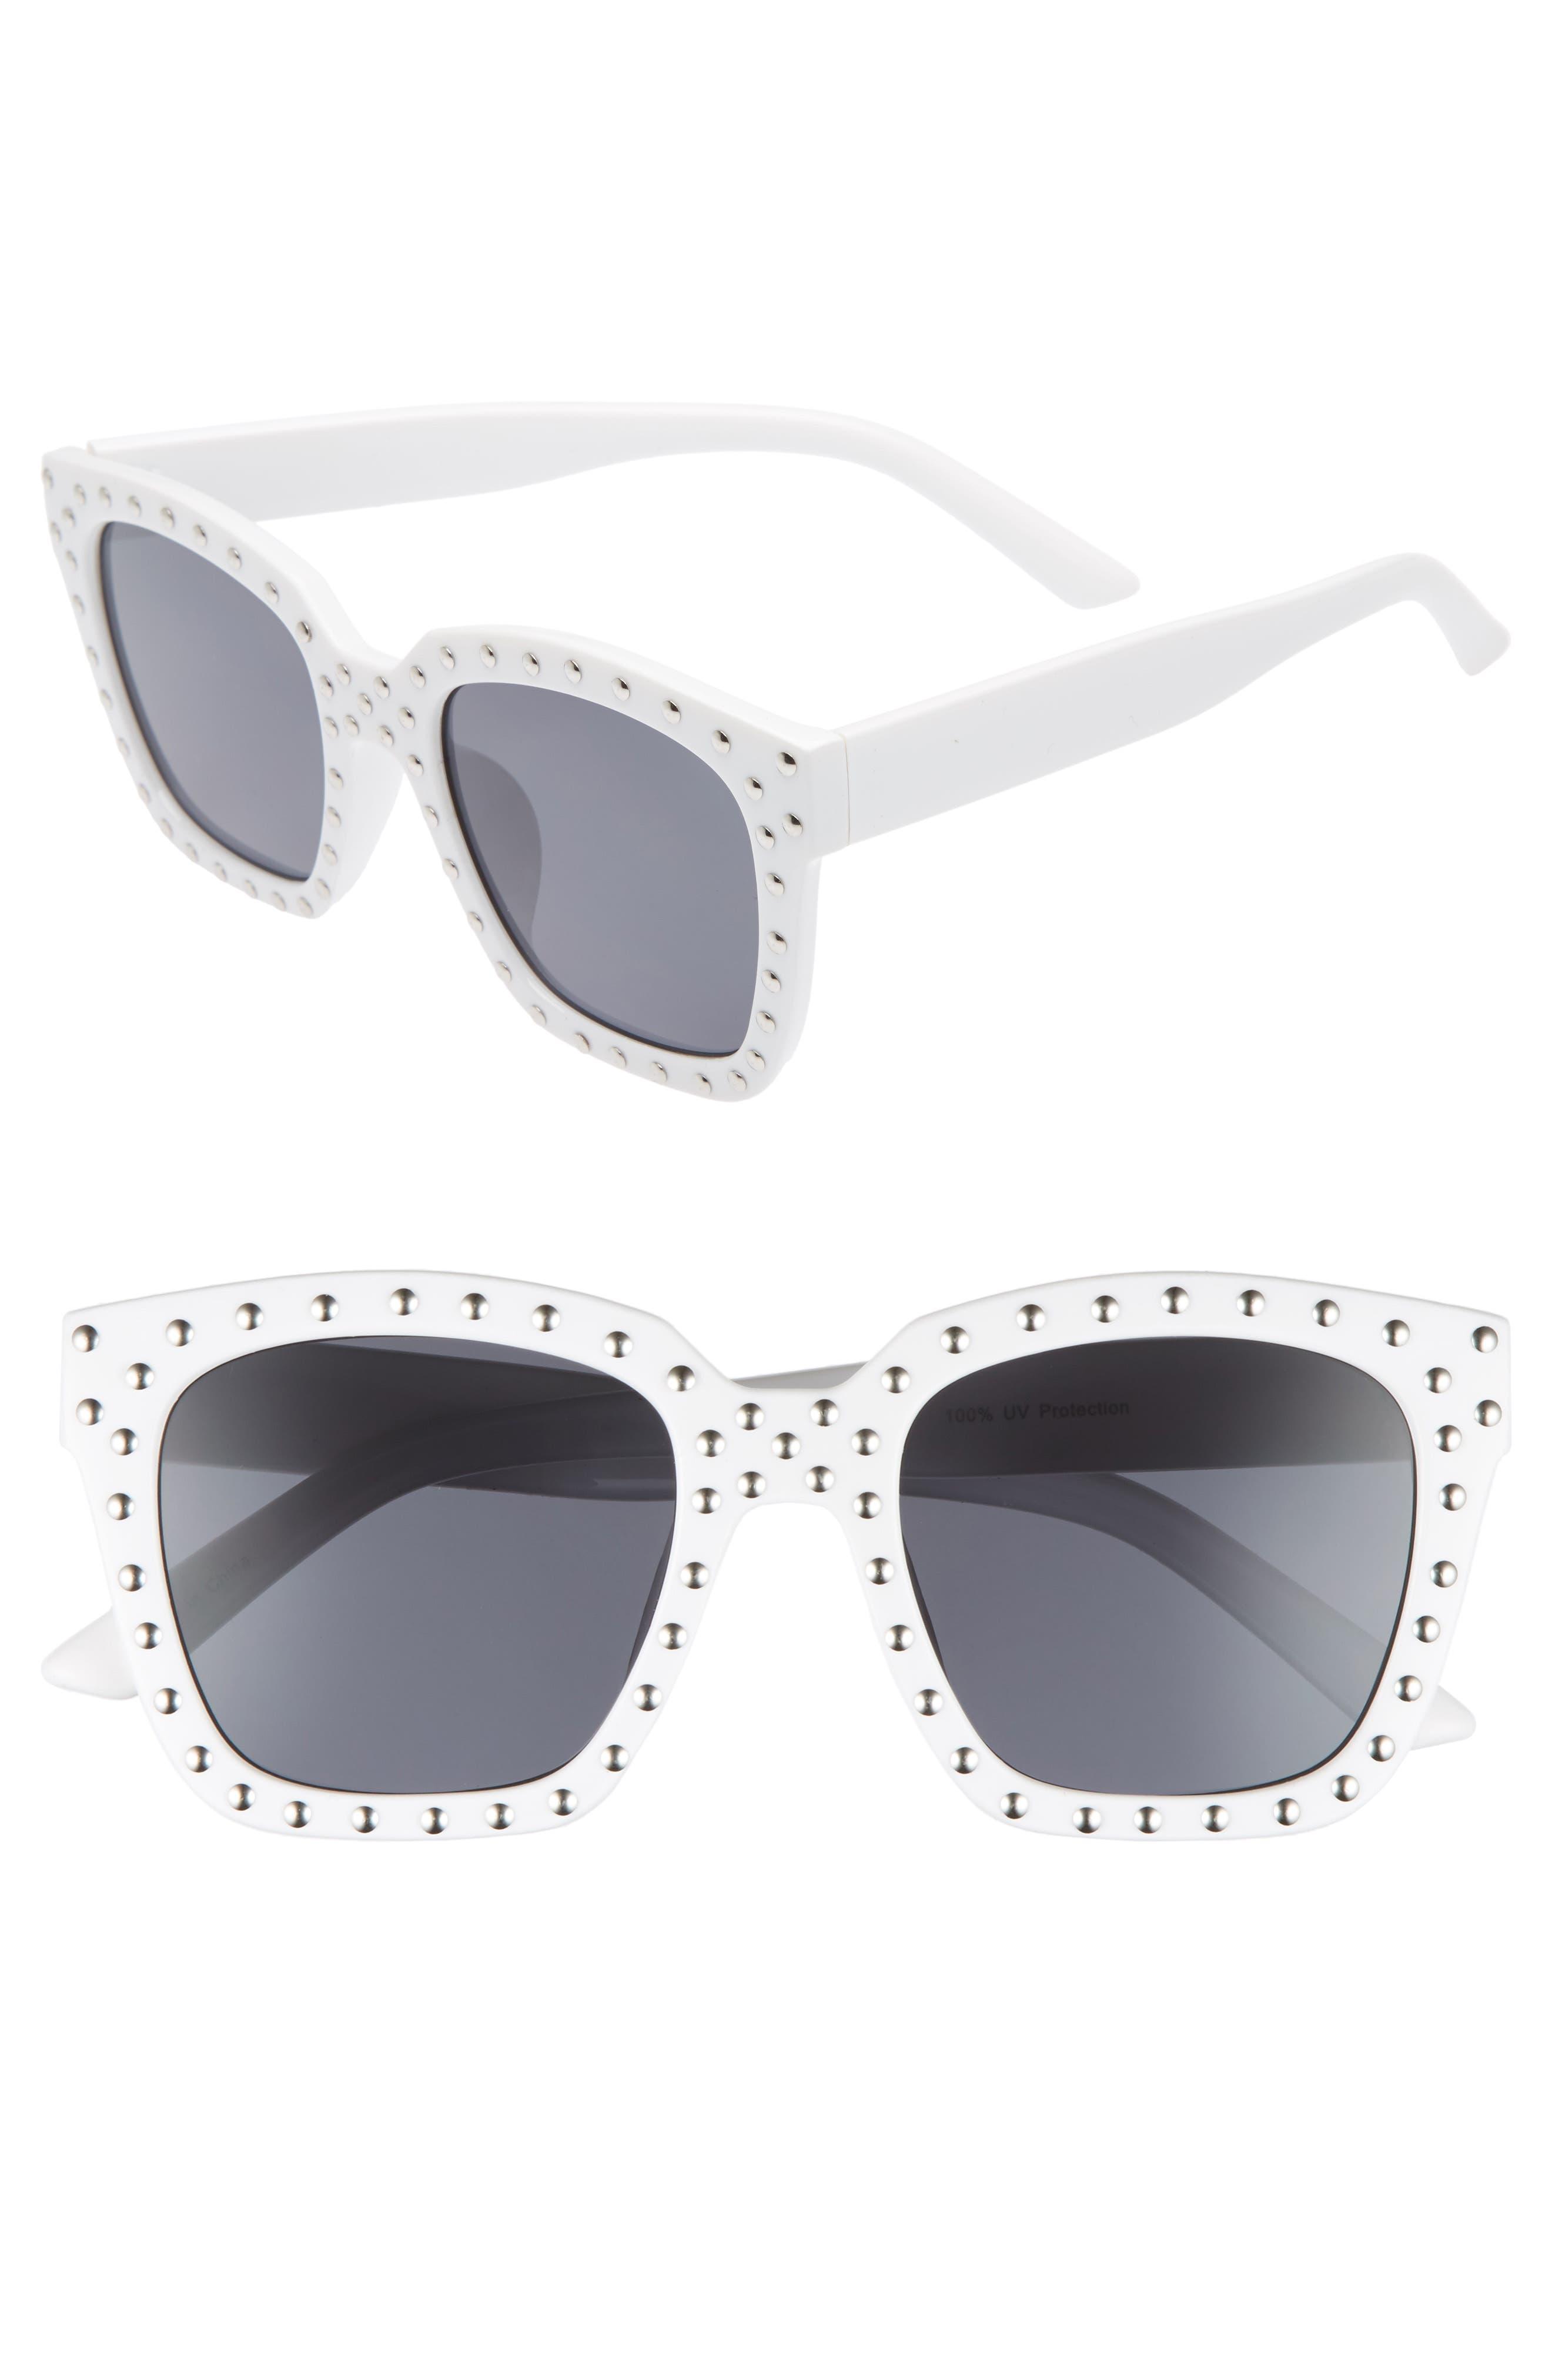 Studded Square Sunglasses,                             Main thumbnail 1, color,                             WHITE/ SILVER